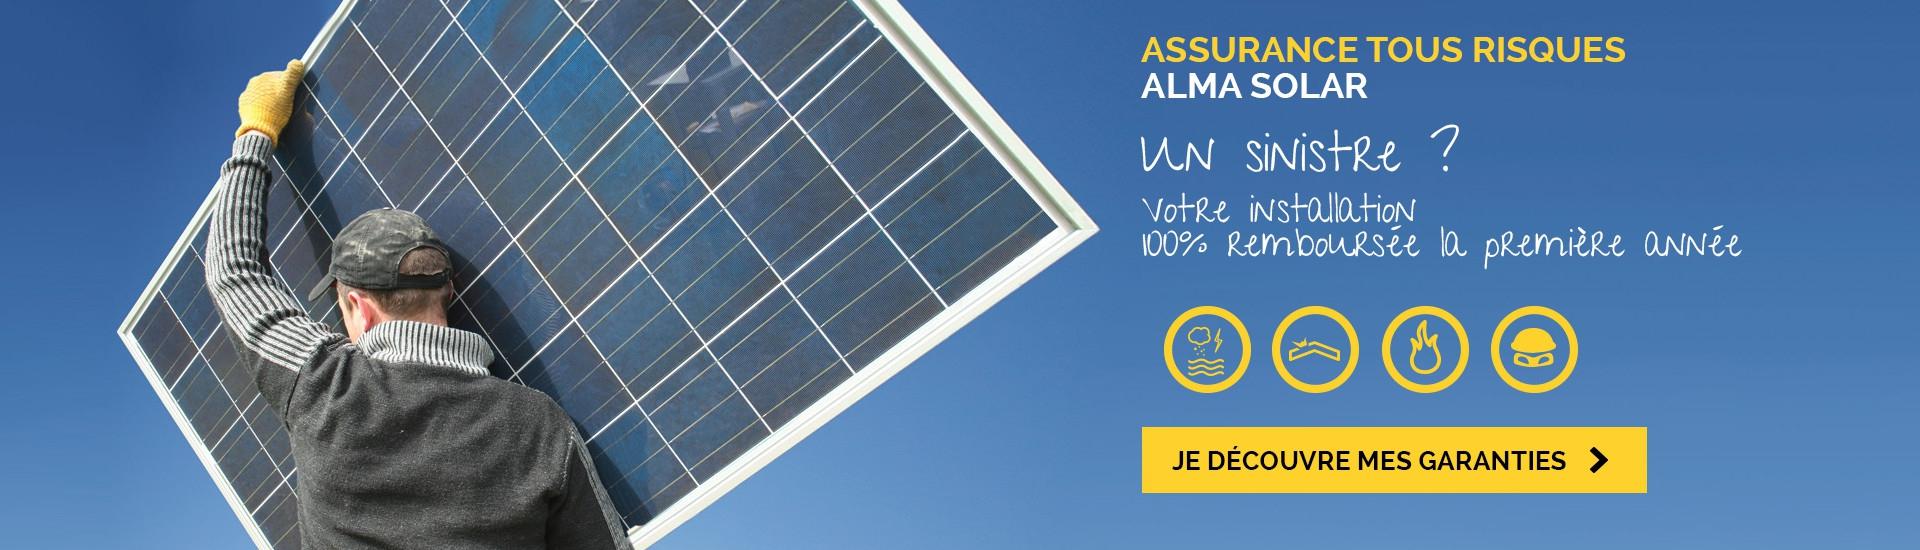 assurance-tous-risques-alma-solar